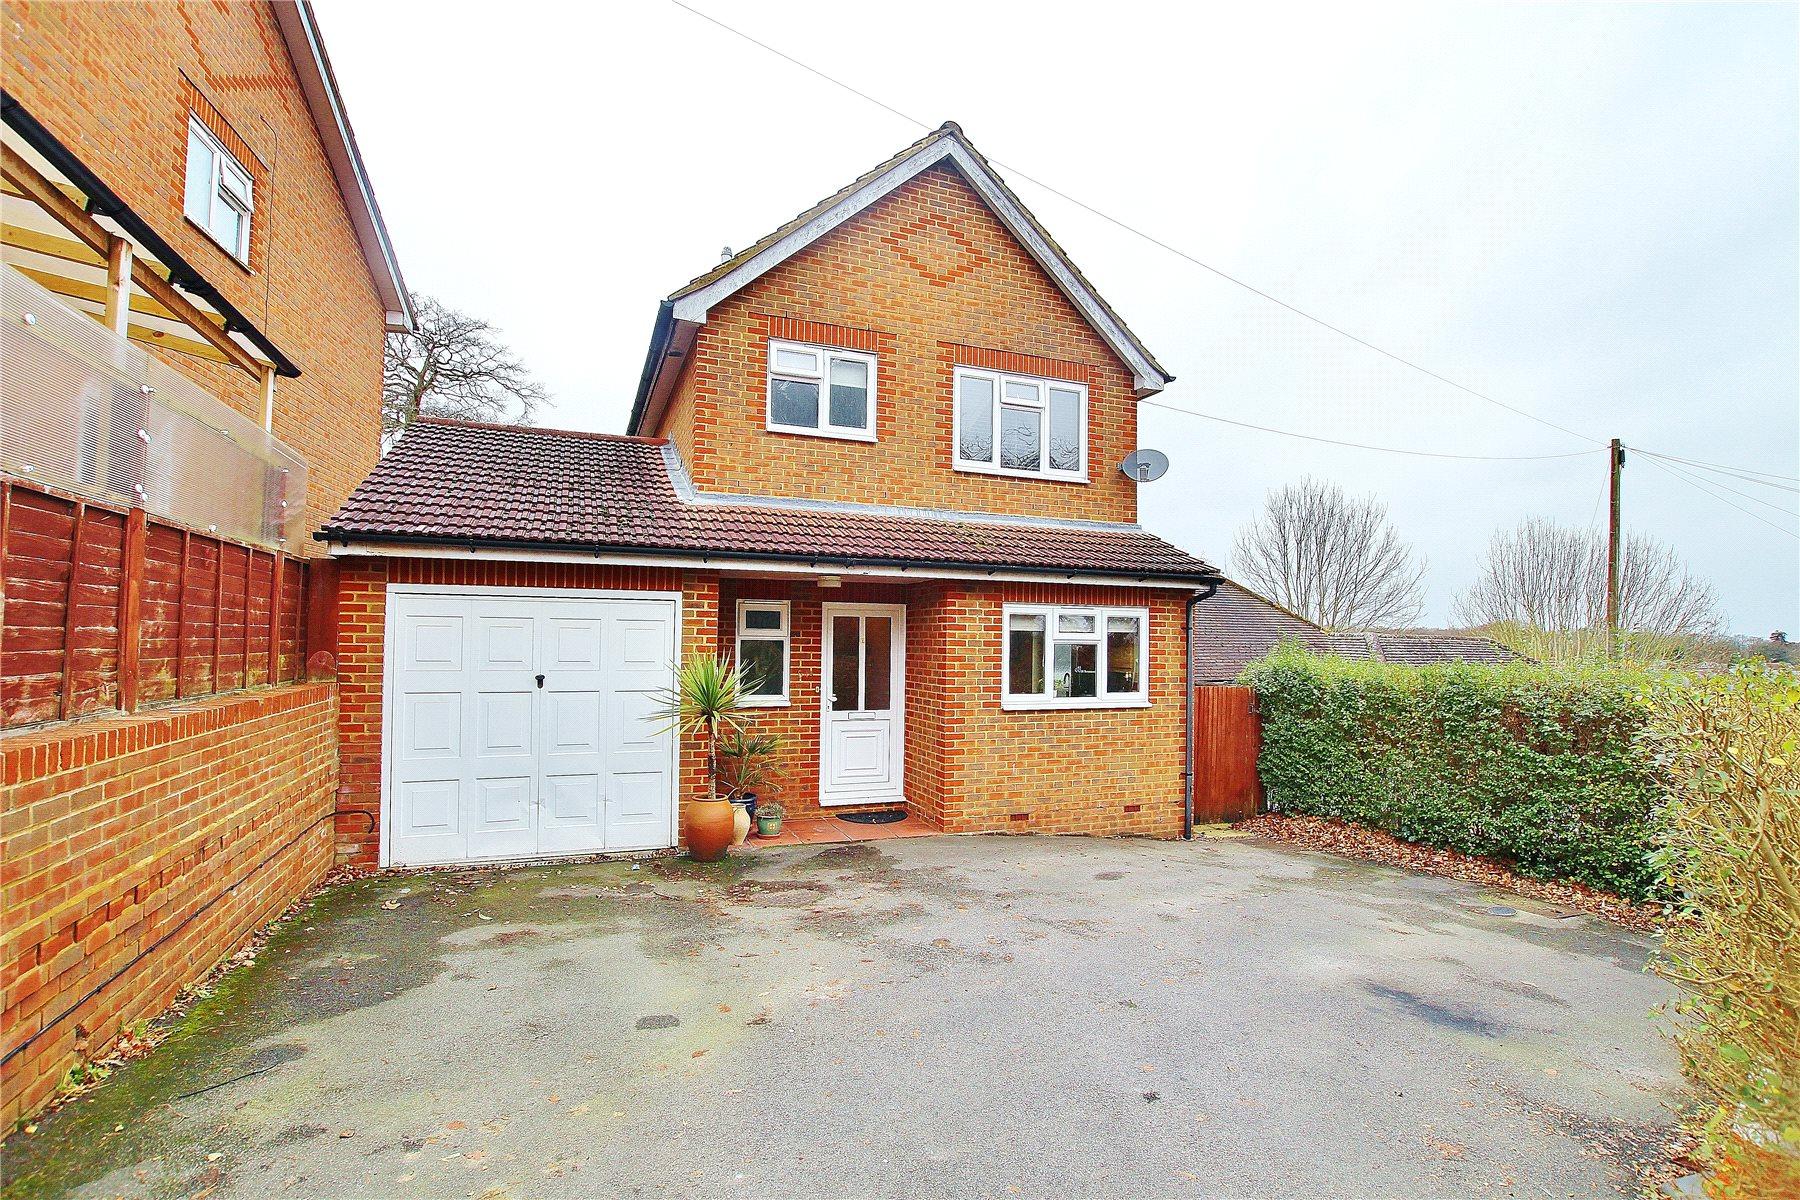 3 Bedrooms Detached House for sale in Beechwood Road, Knaphill, Woking, Surrey, GU21